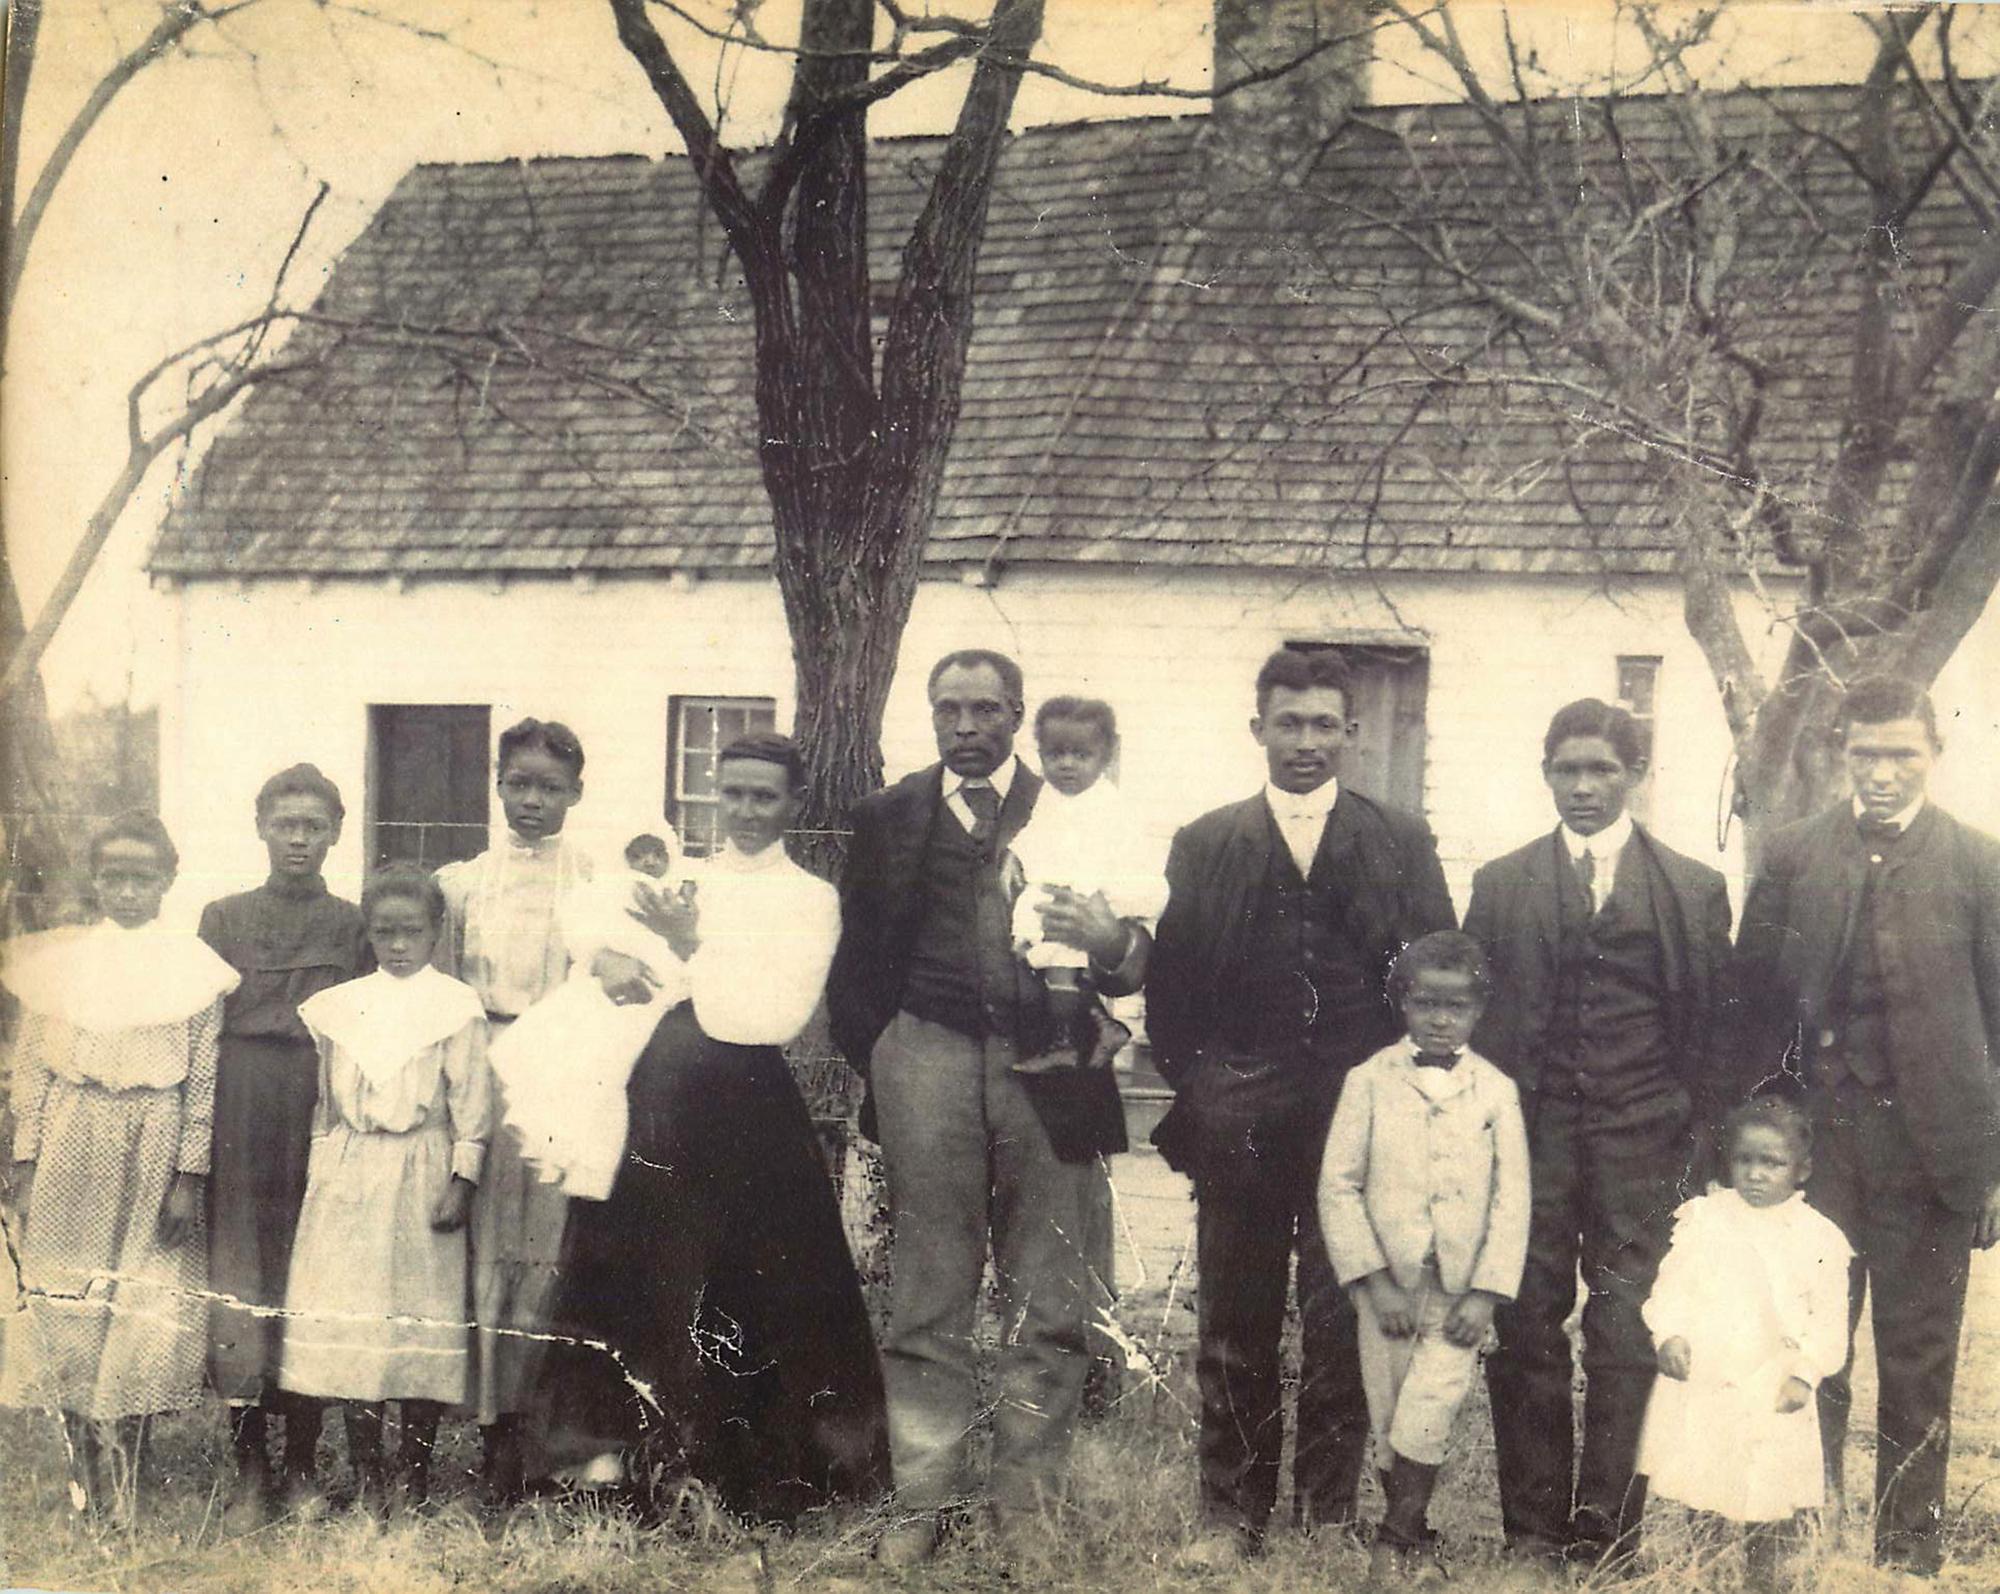 Before Family portrait, c. 1900